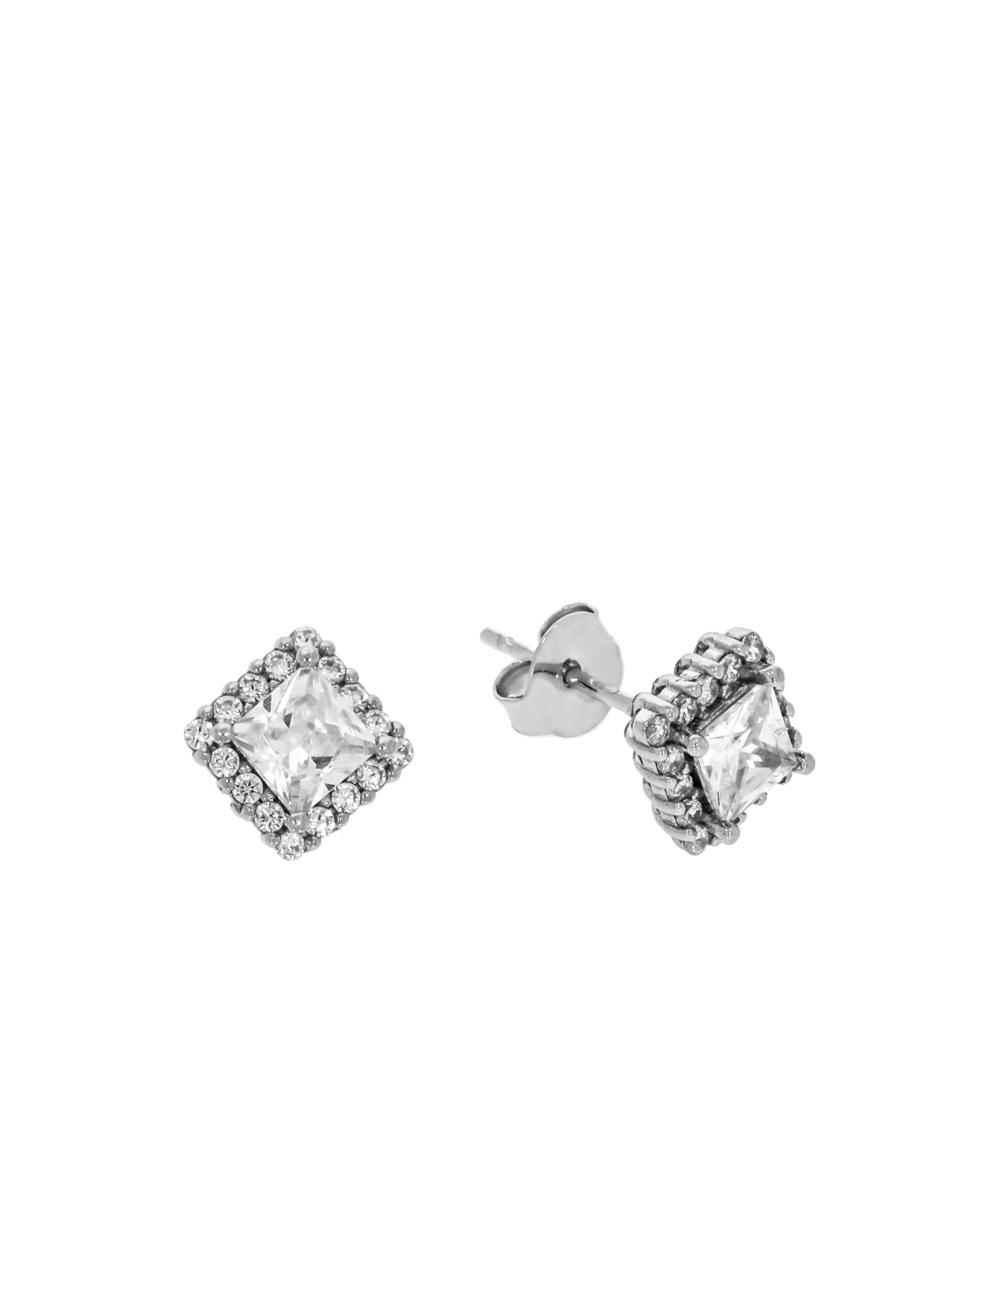 10013398 Kolczyki srebrne pr.925 z cyrkoniami